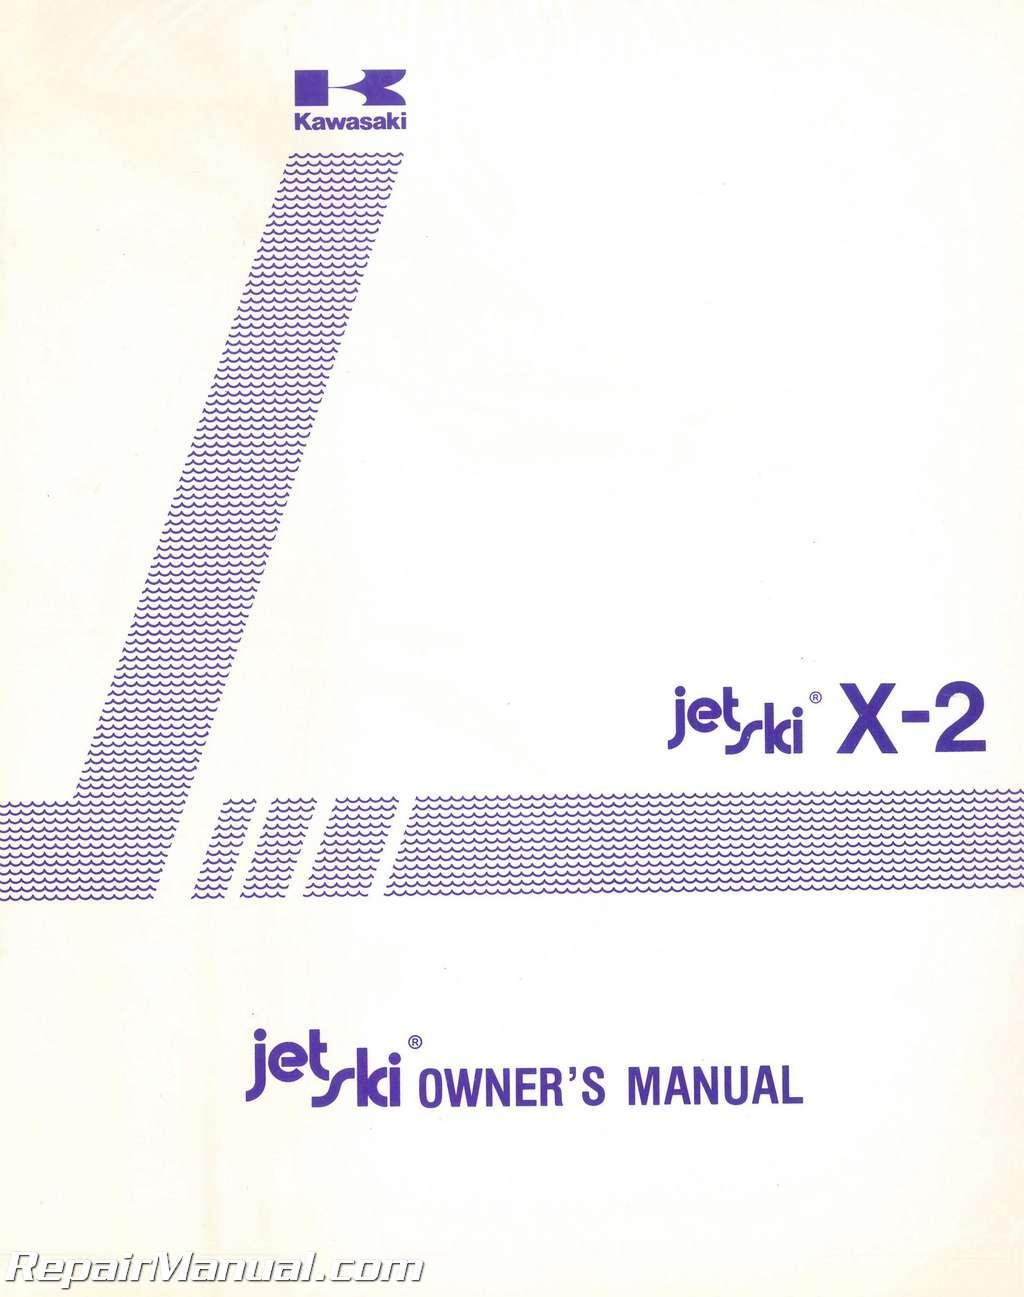 1988 Kawasaki JF650A3 X-2 Jet Ski Factory Owners Manual 01